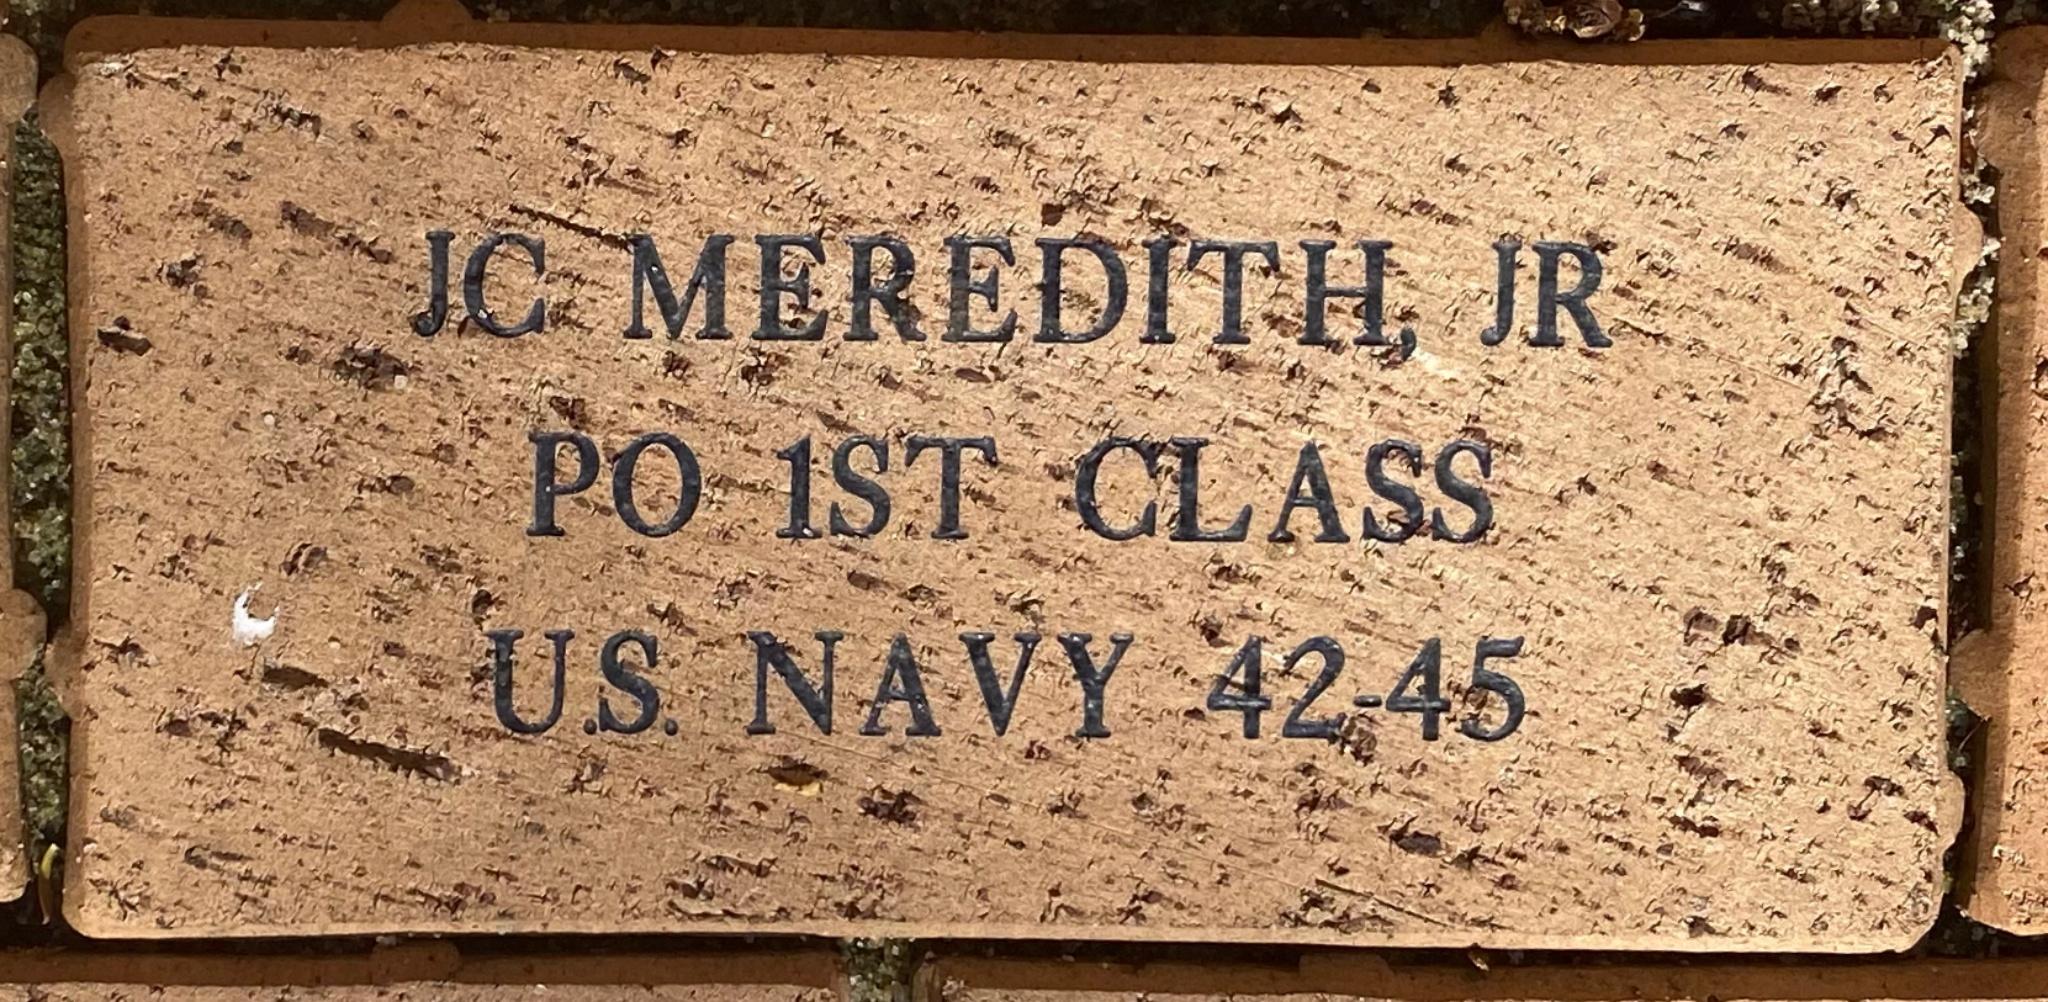 J.C. MEREDITH, JR PO 1ST CLASS U.S. NAVY 42-45